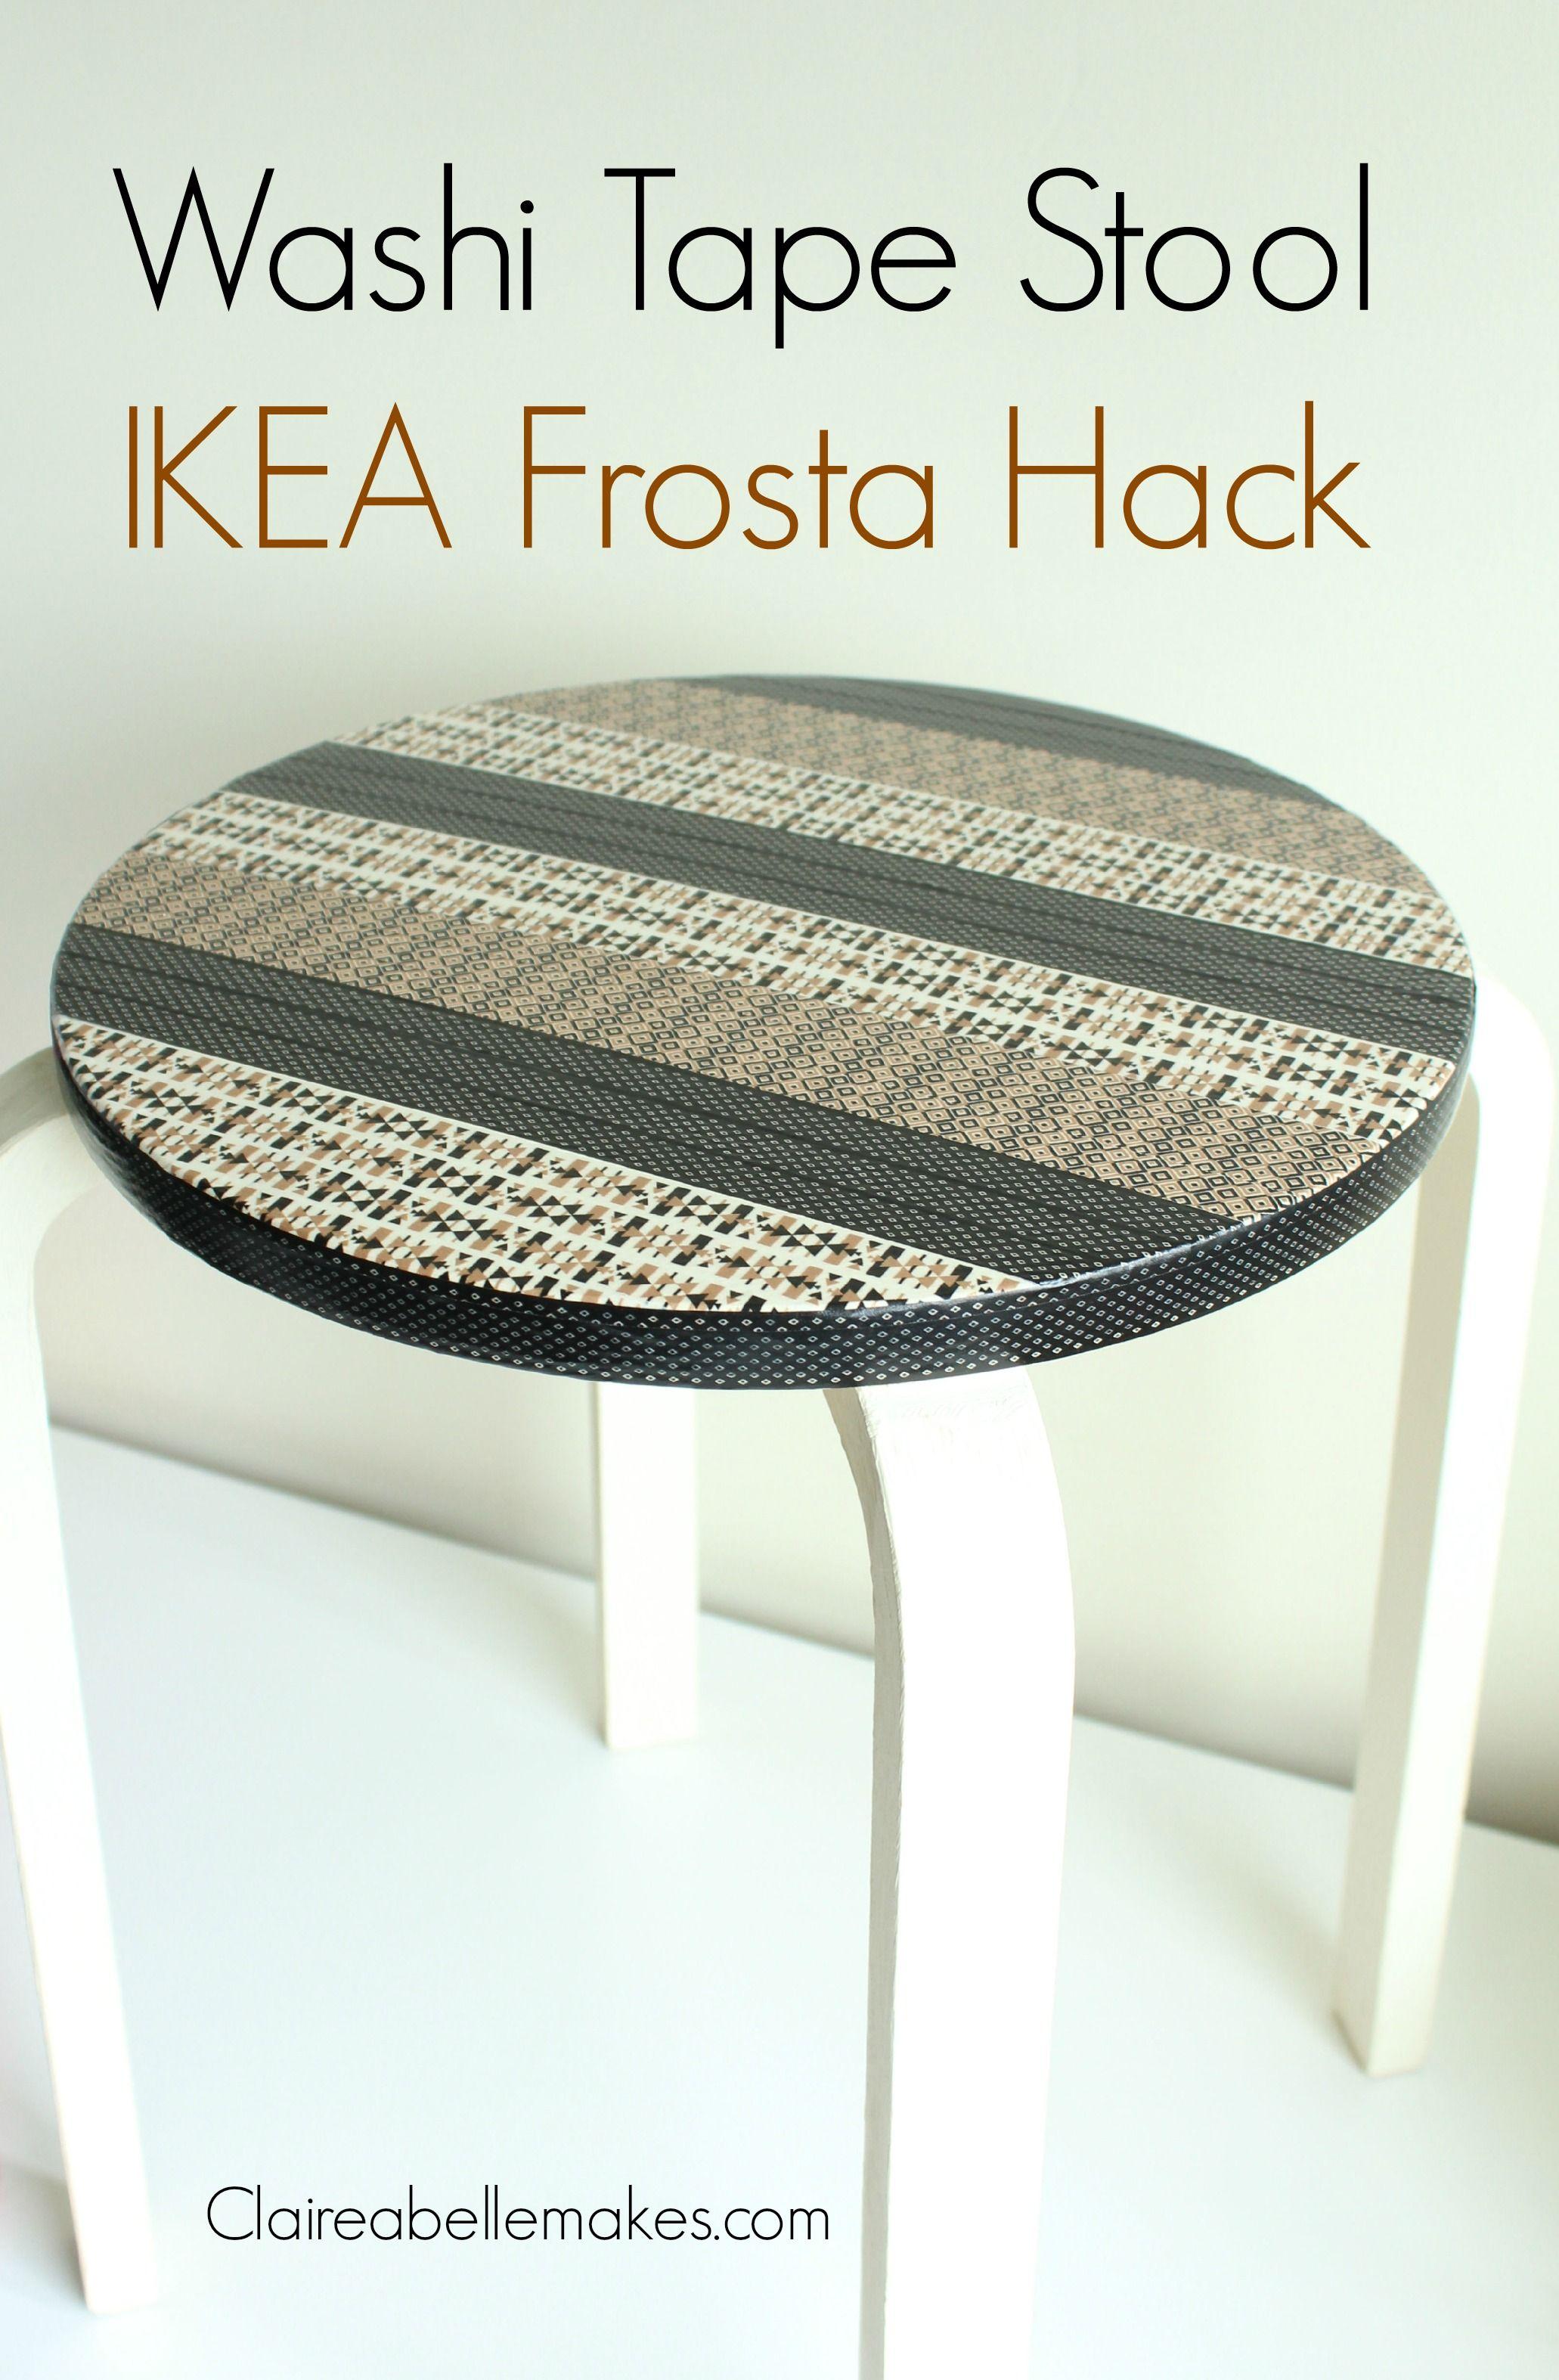 ikea hack diy washi tape stool ikea hack washi tape and washi. Black Bedroom Furniture Sets. Home Design Ideas